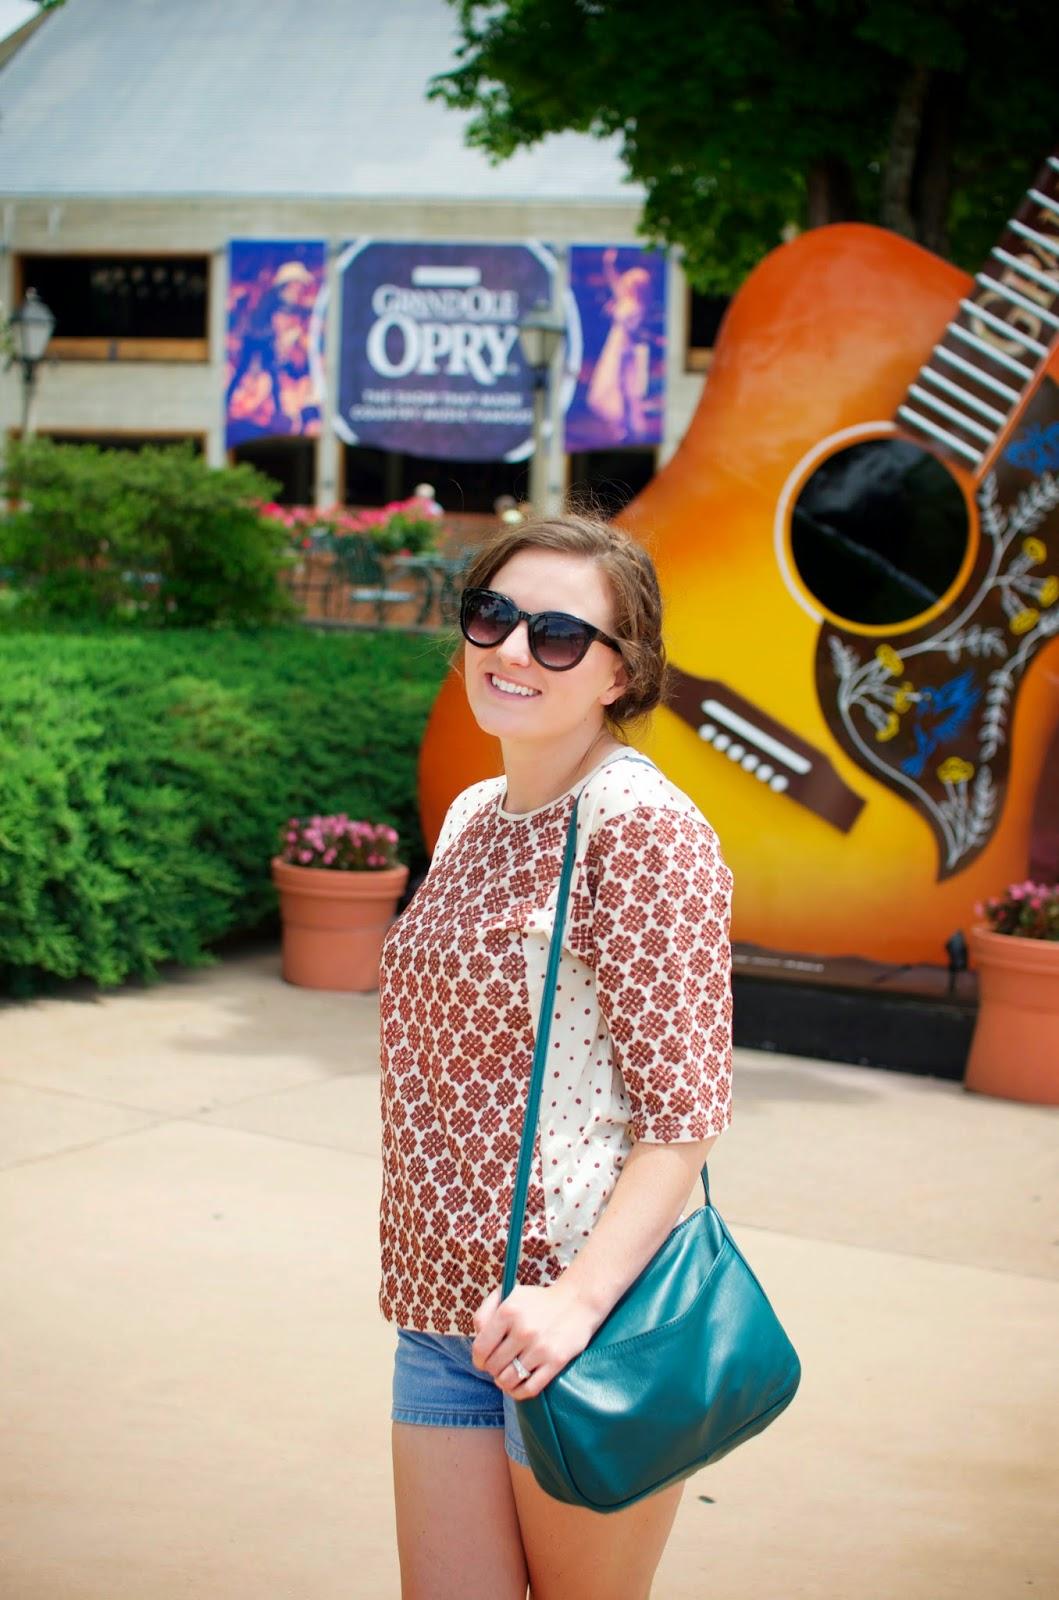 Grand Ole Opry | Love Lola